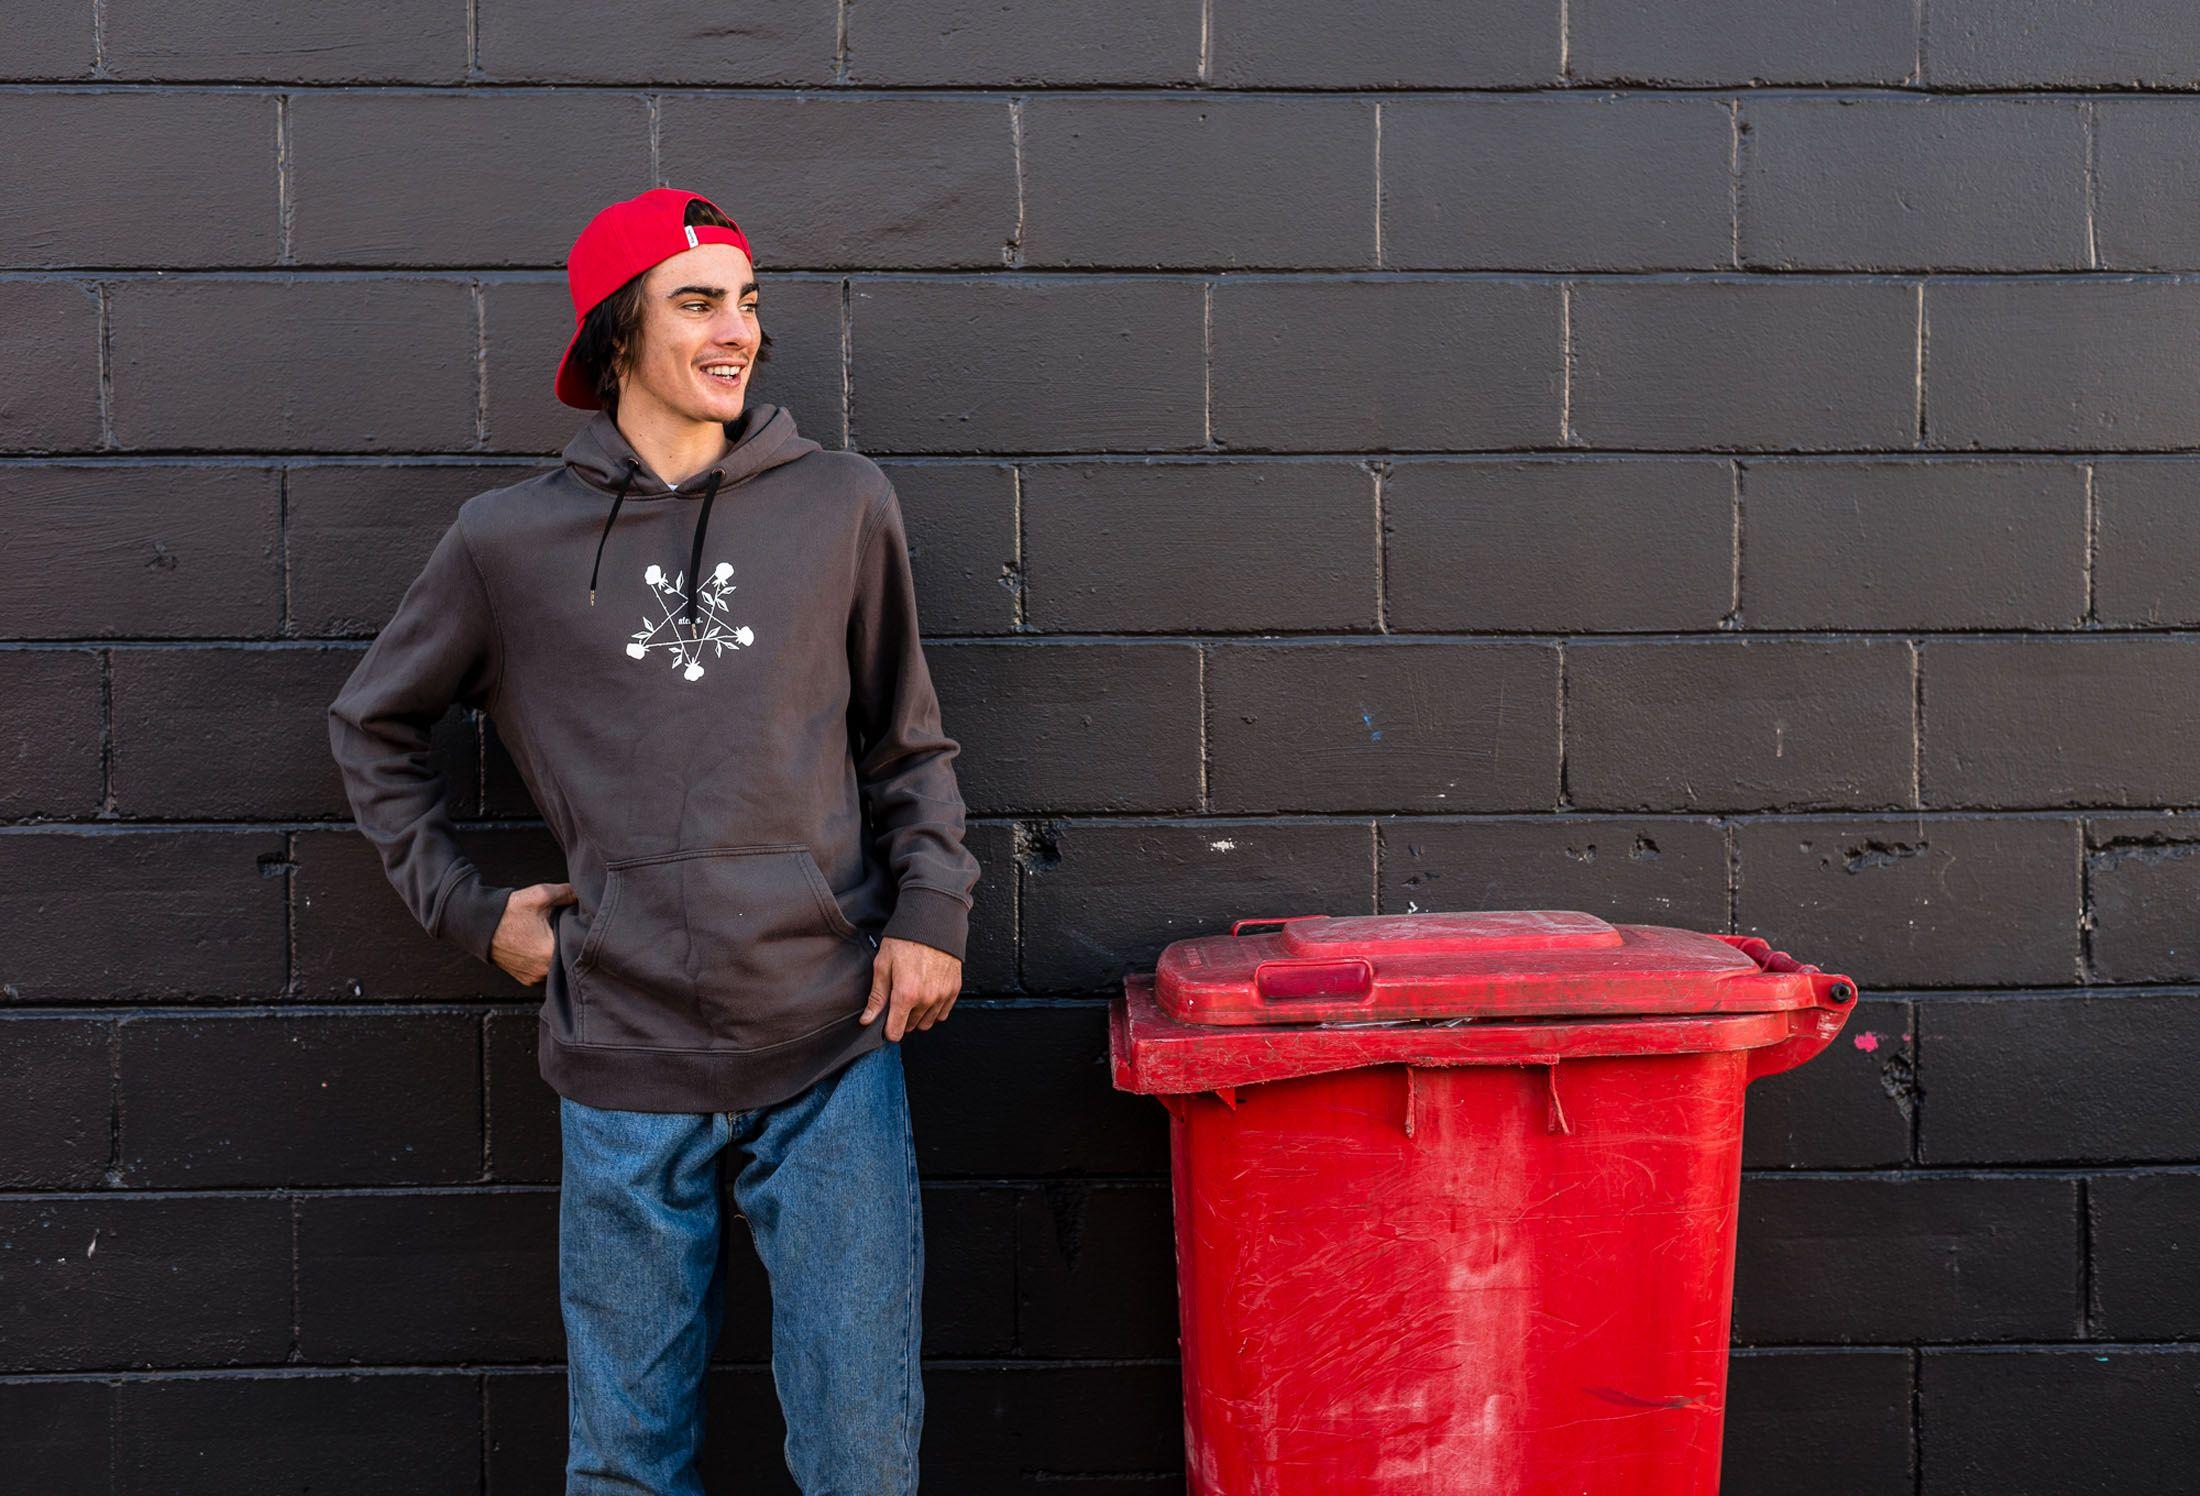 e041b27e Afends Mens Pentagram Hoodie Byron Bay @afends @wade_mclaughlin #afends # clothing #byronbay #hemp #tee #mens #jeans #skate #skateboarding  @chongonlivelong ...